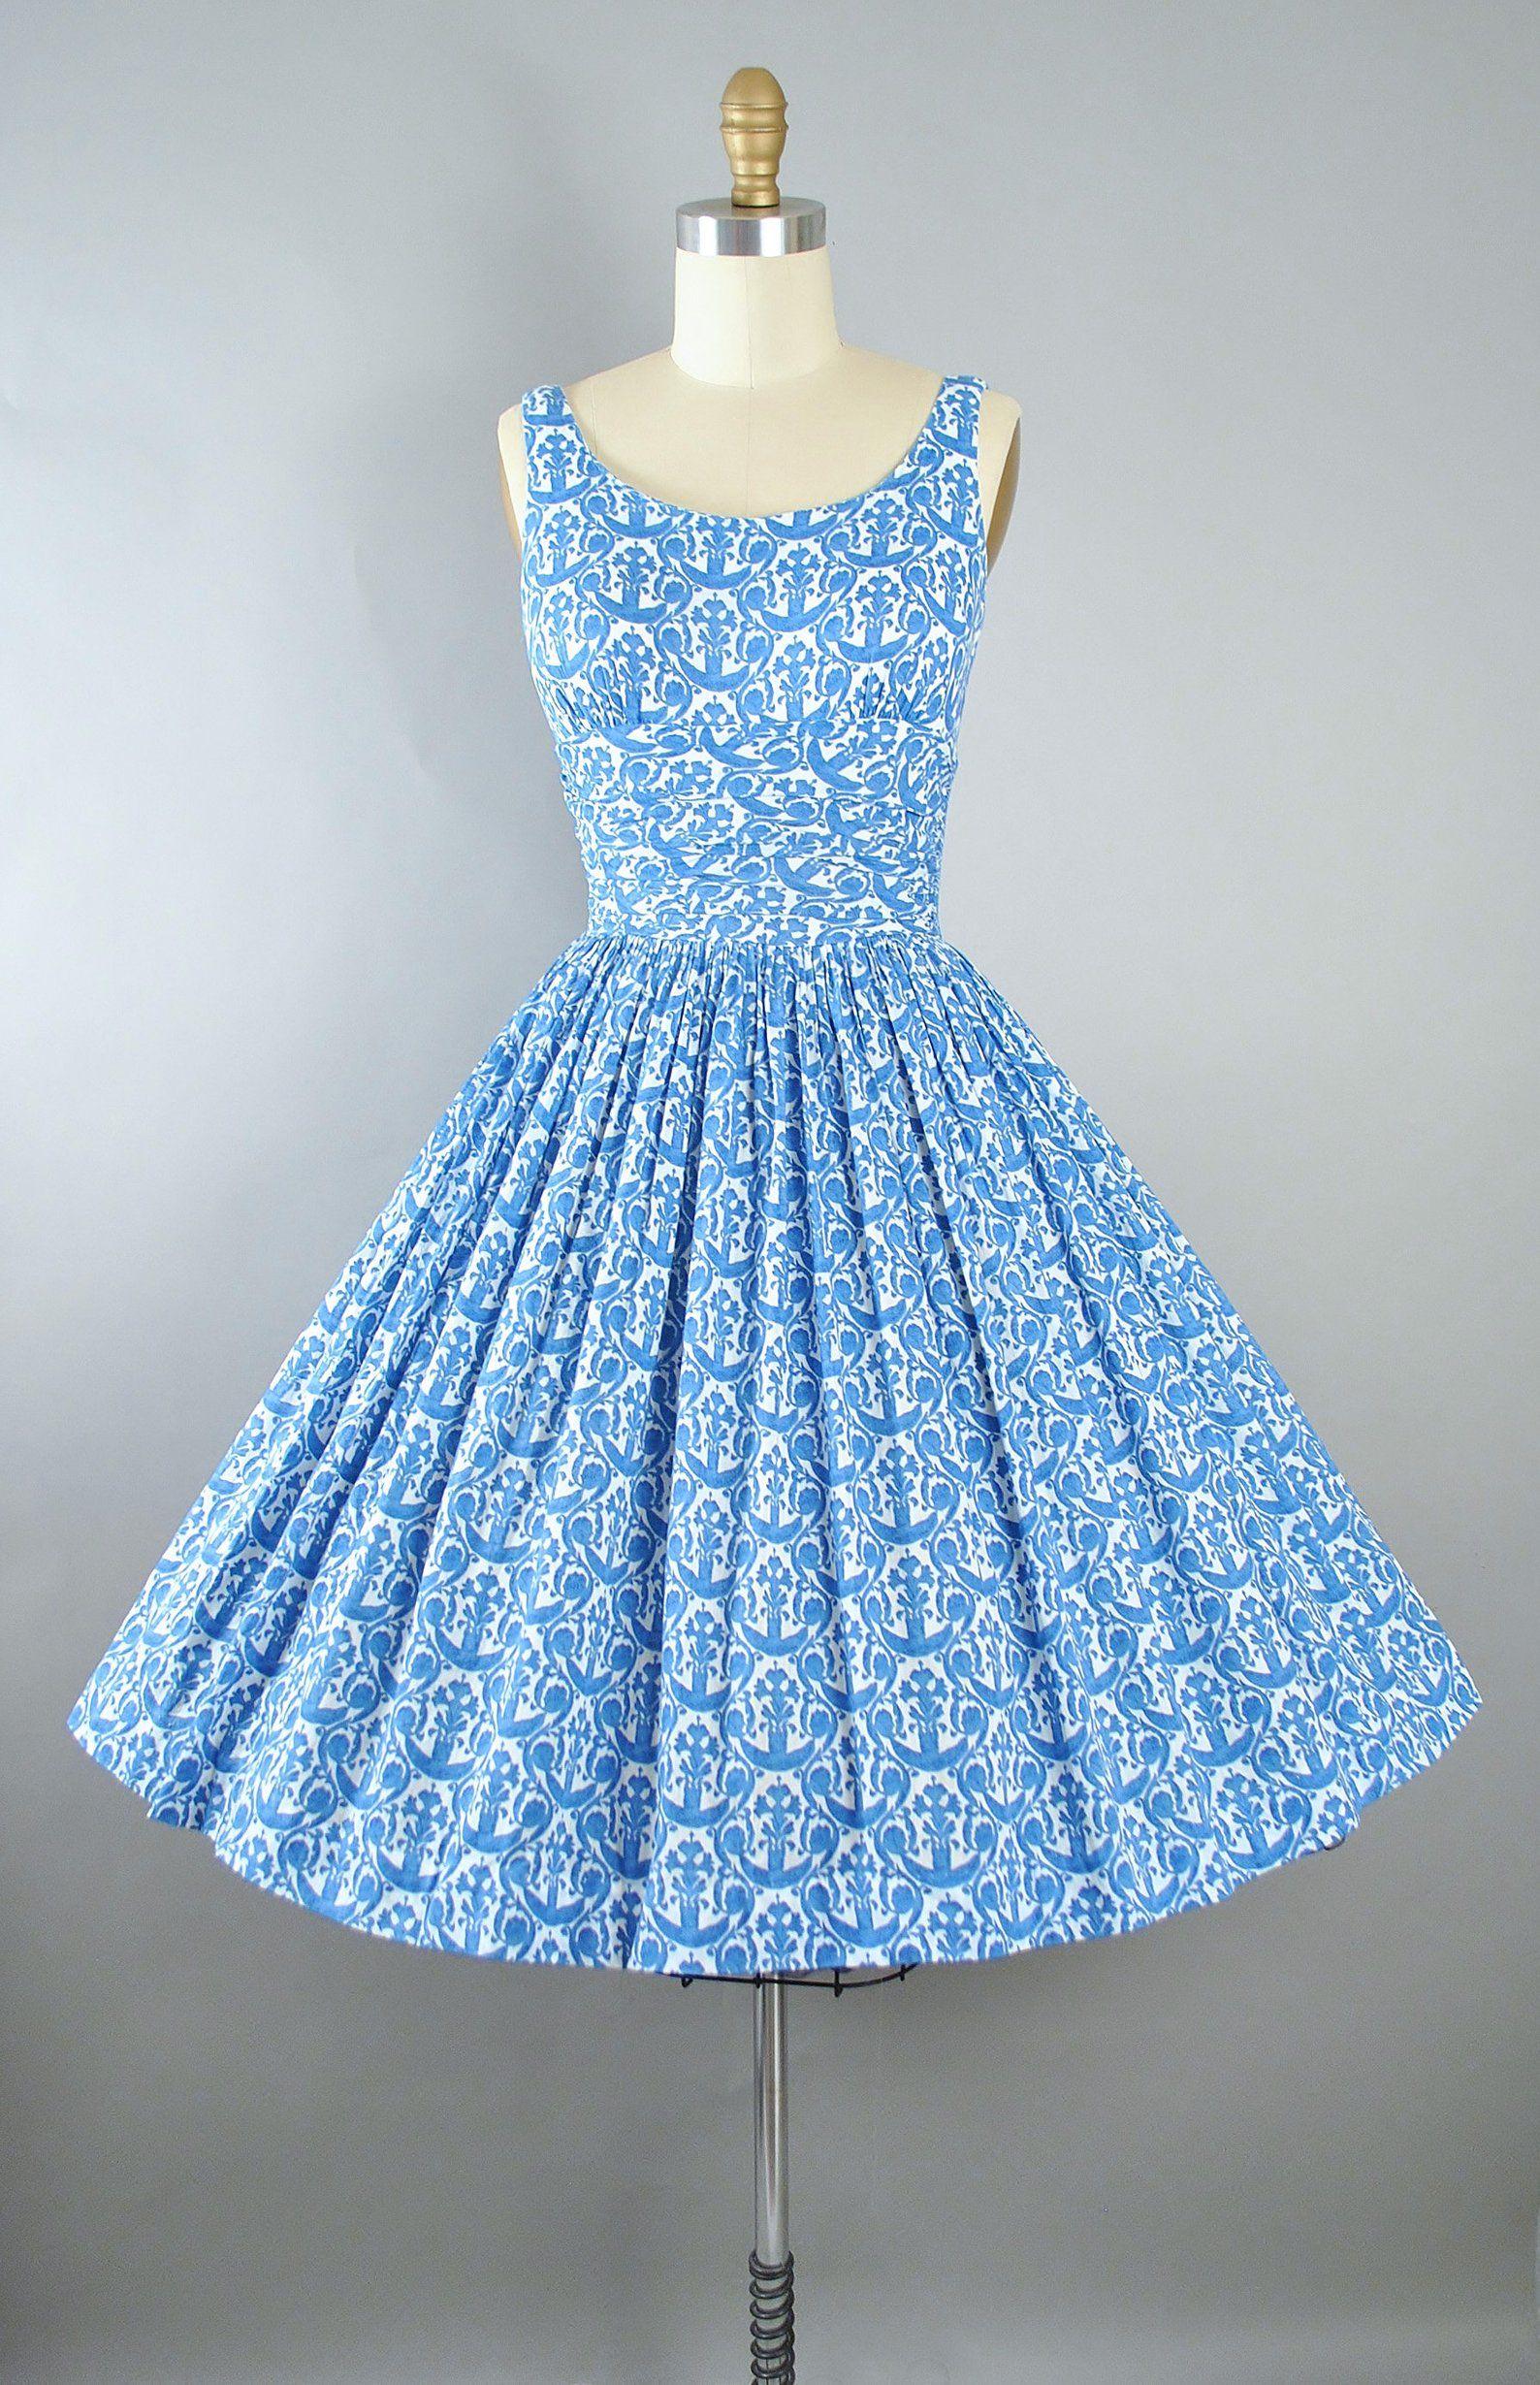 Vintage 50s Jonathan Logan Dress Set 1950s Cotton Sundress Etsy Vintage Summer Dresses Jonathan Logan Dress Set Dress [ 2459 x 1588 Pixel ]